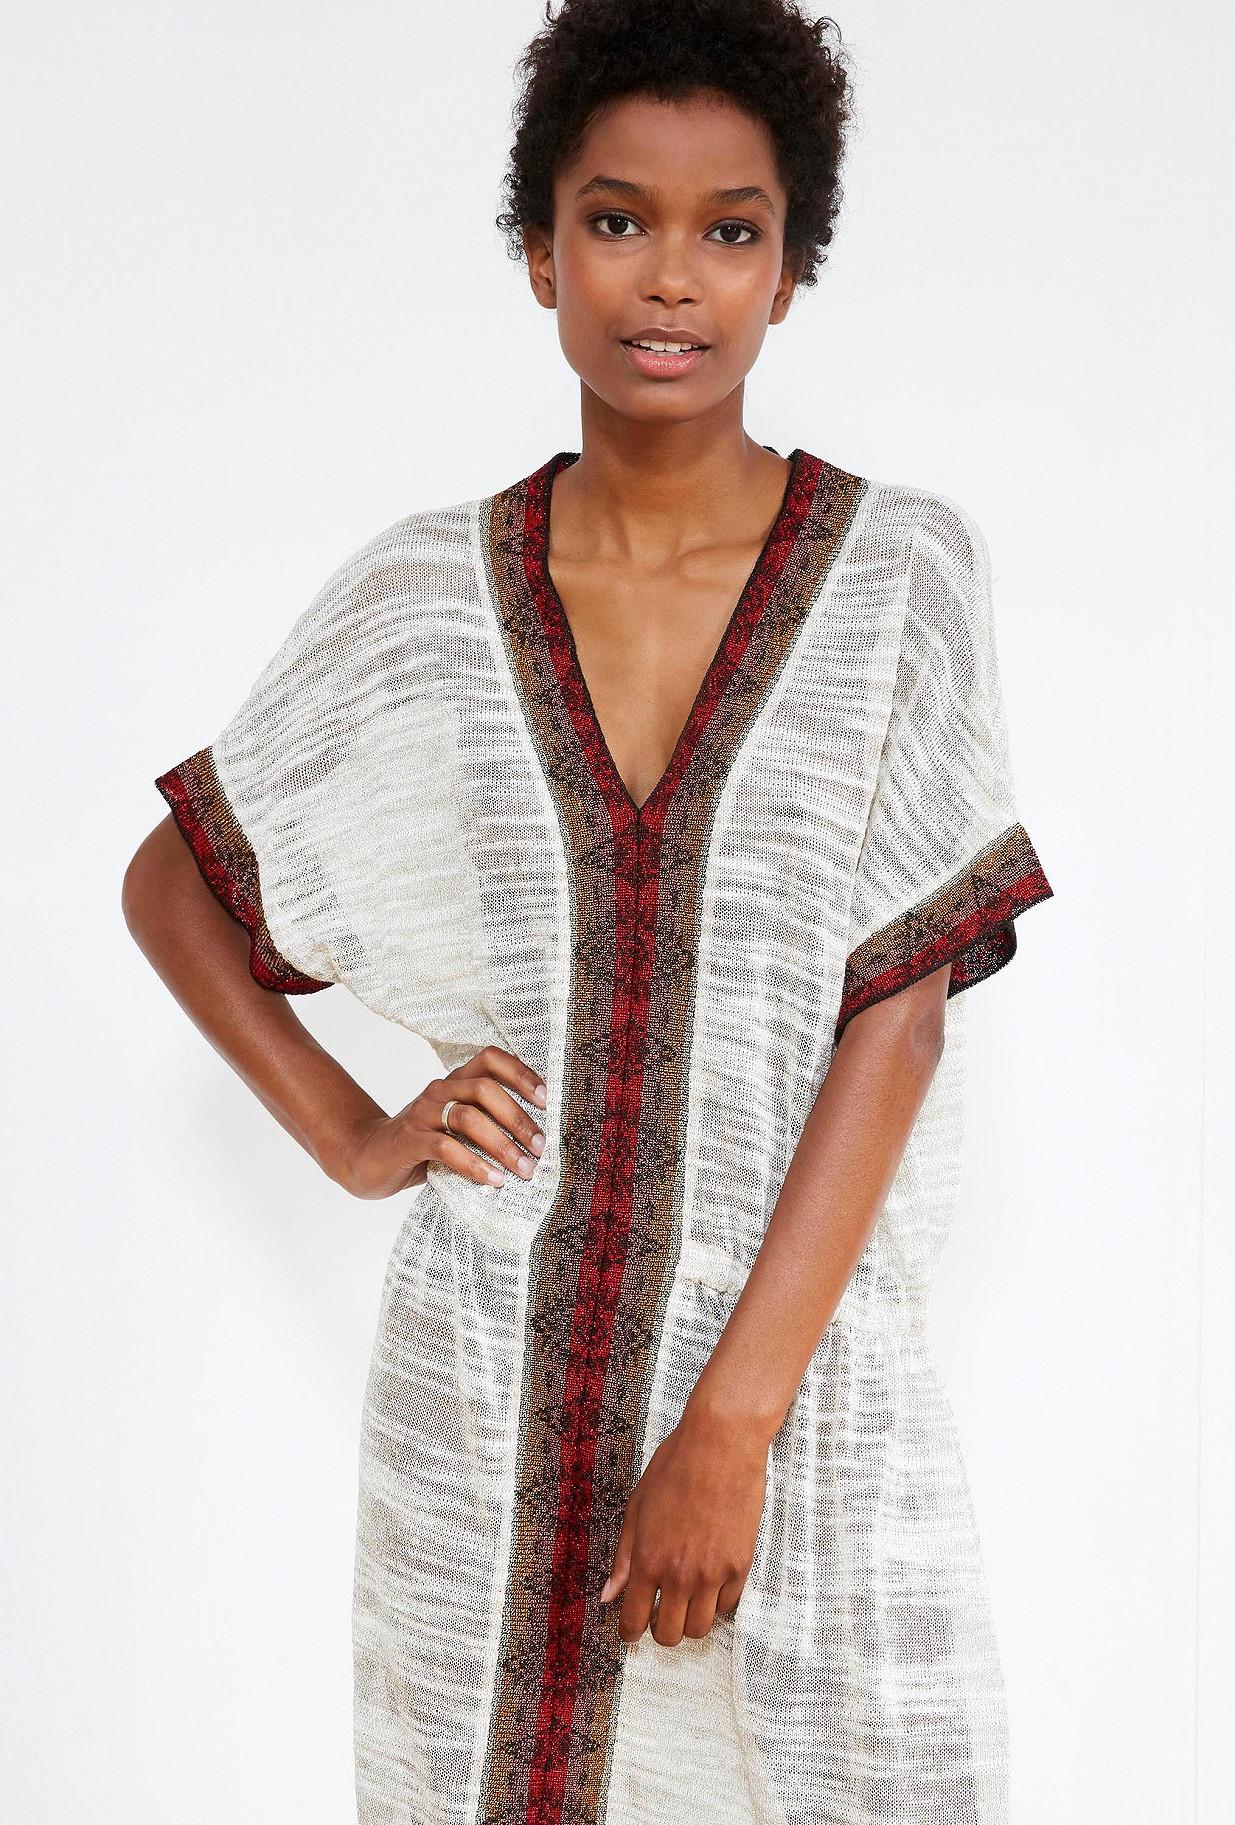 clothes store DRESS  Saba french designer fashion Paris